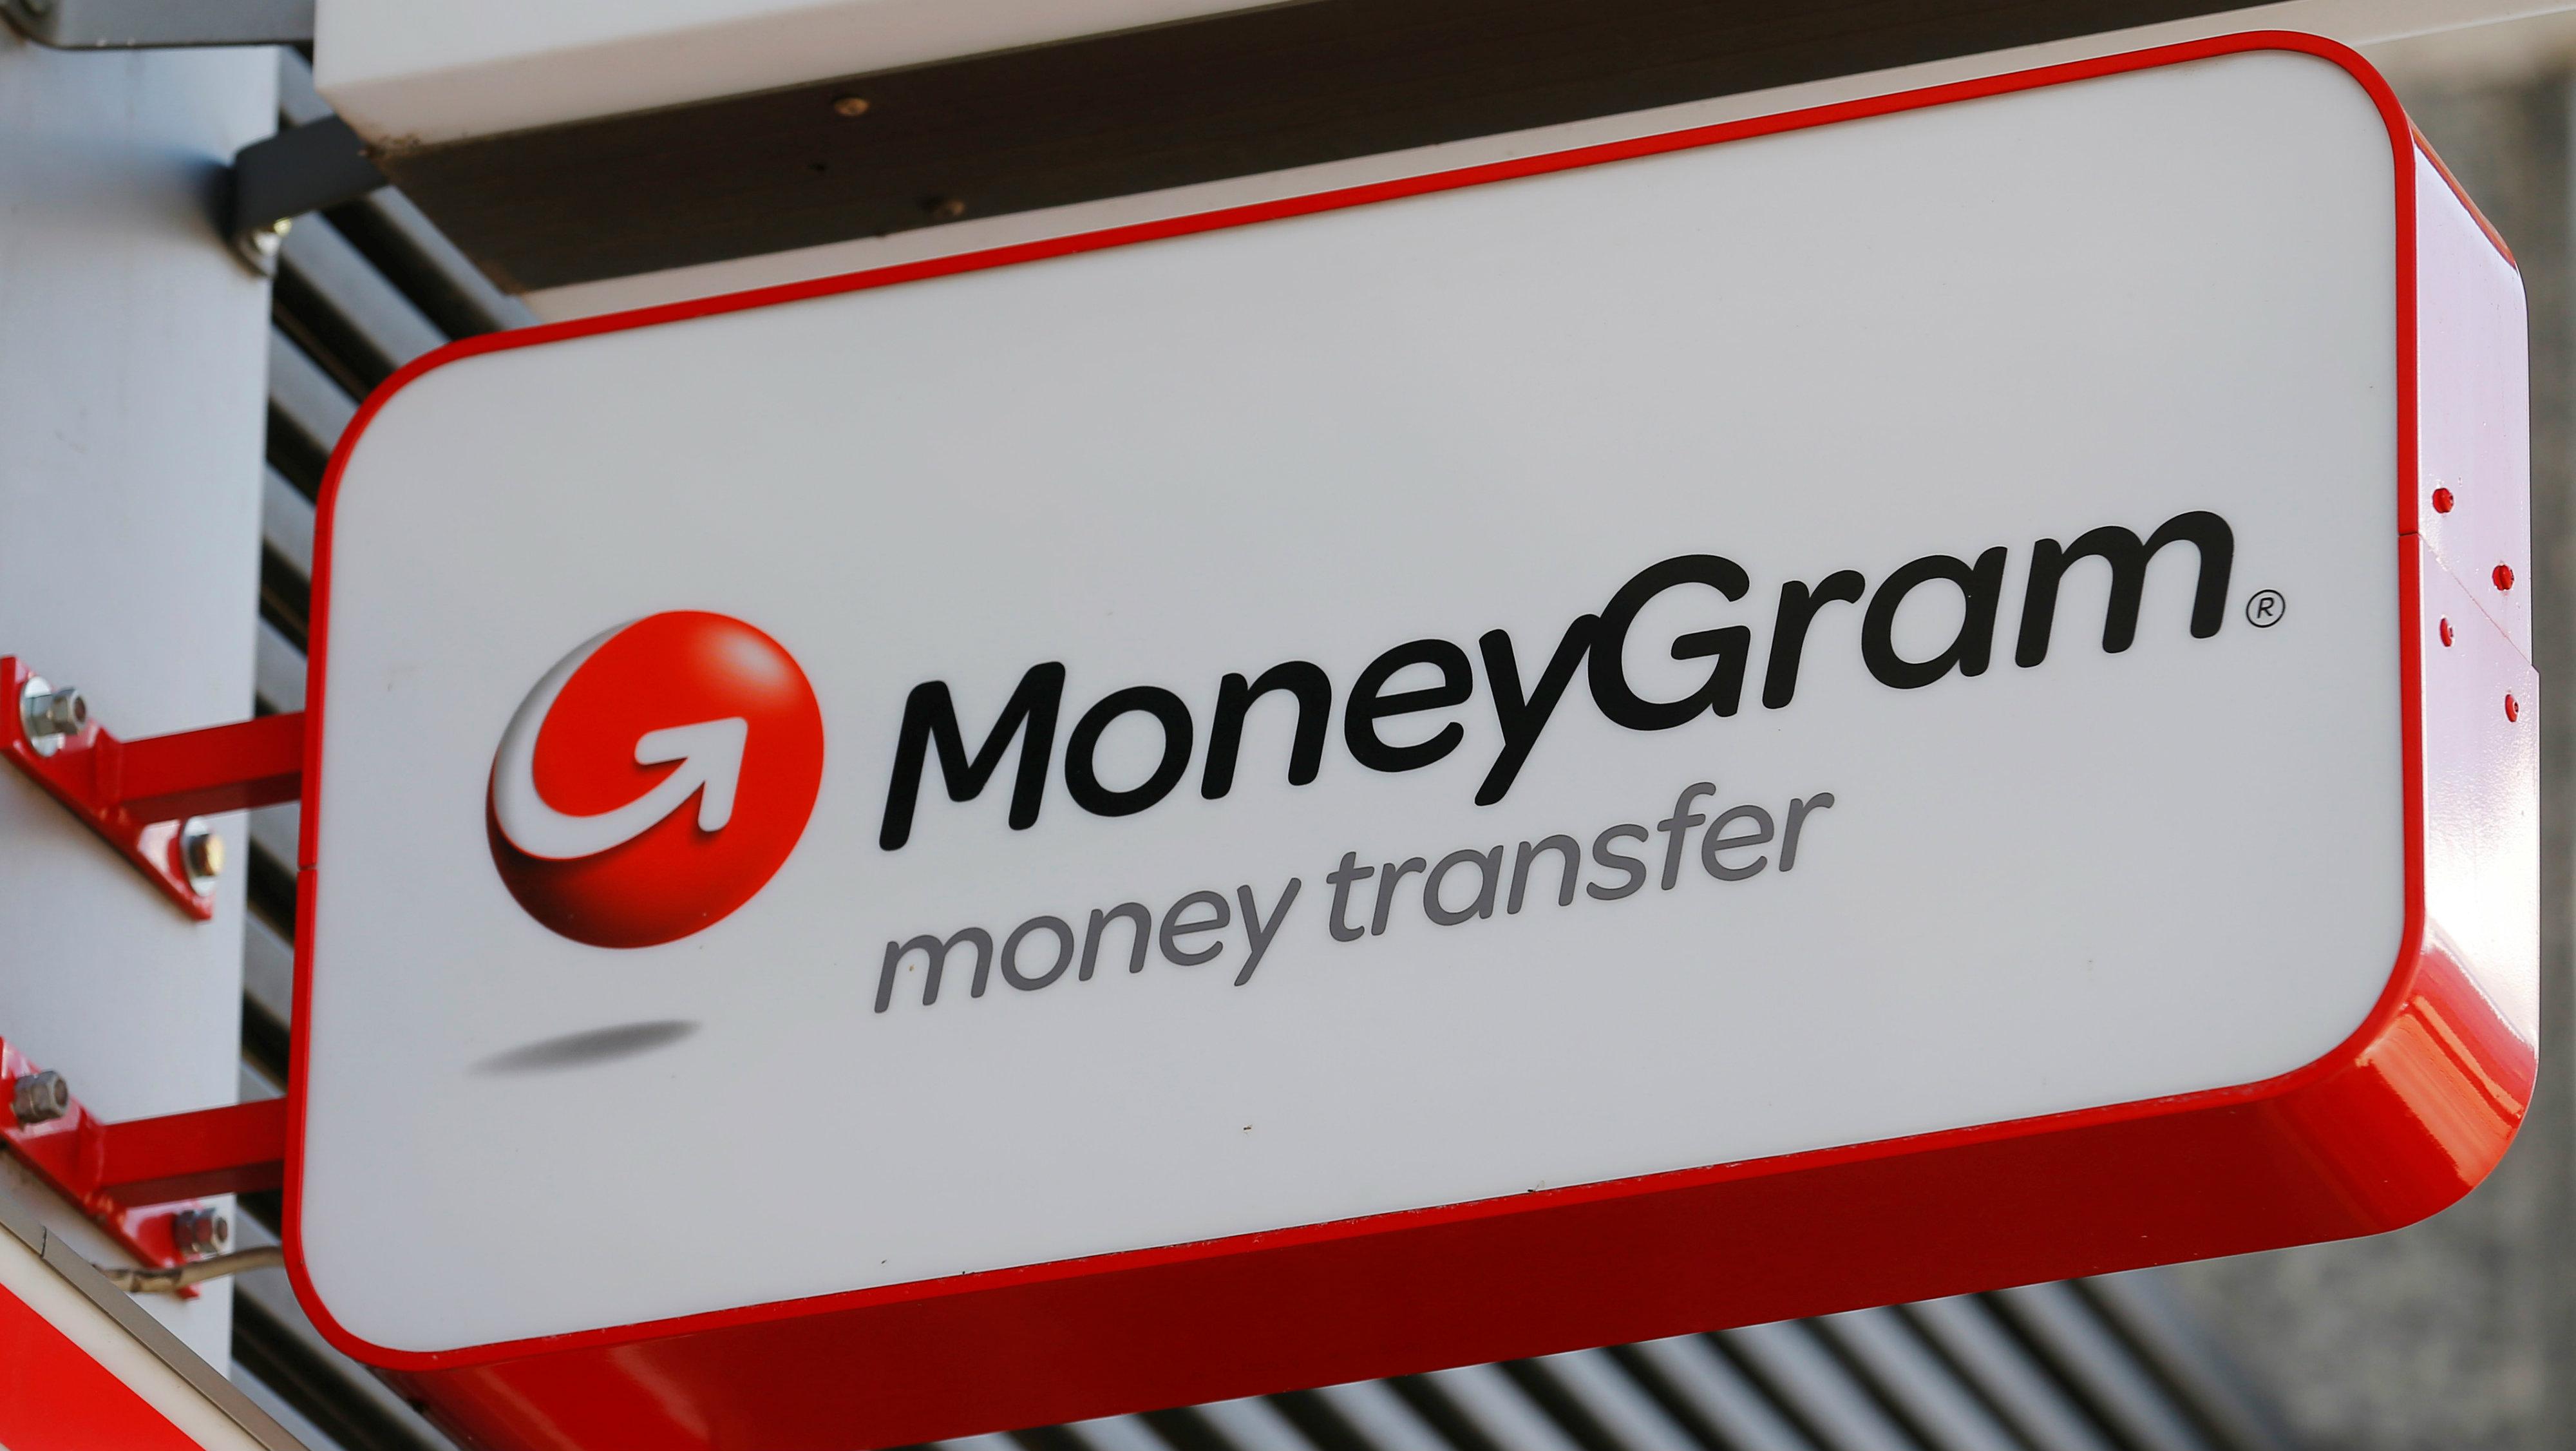 A Moneygram logo is seen outside a bank in Vienna, Austria, June 28, 2016